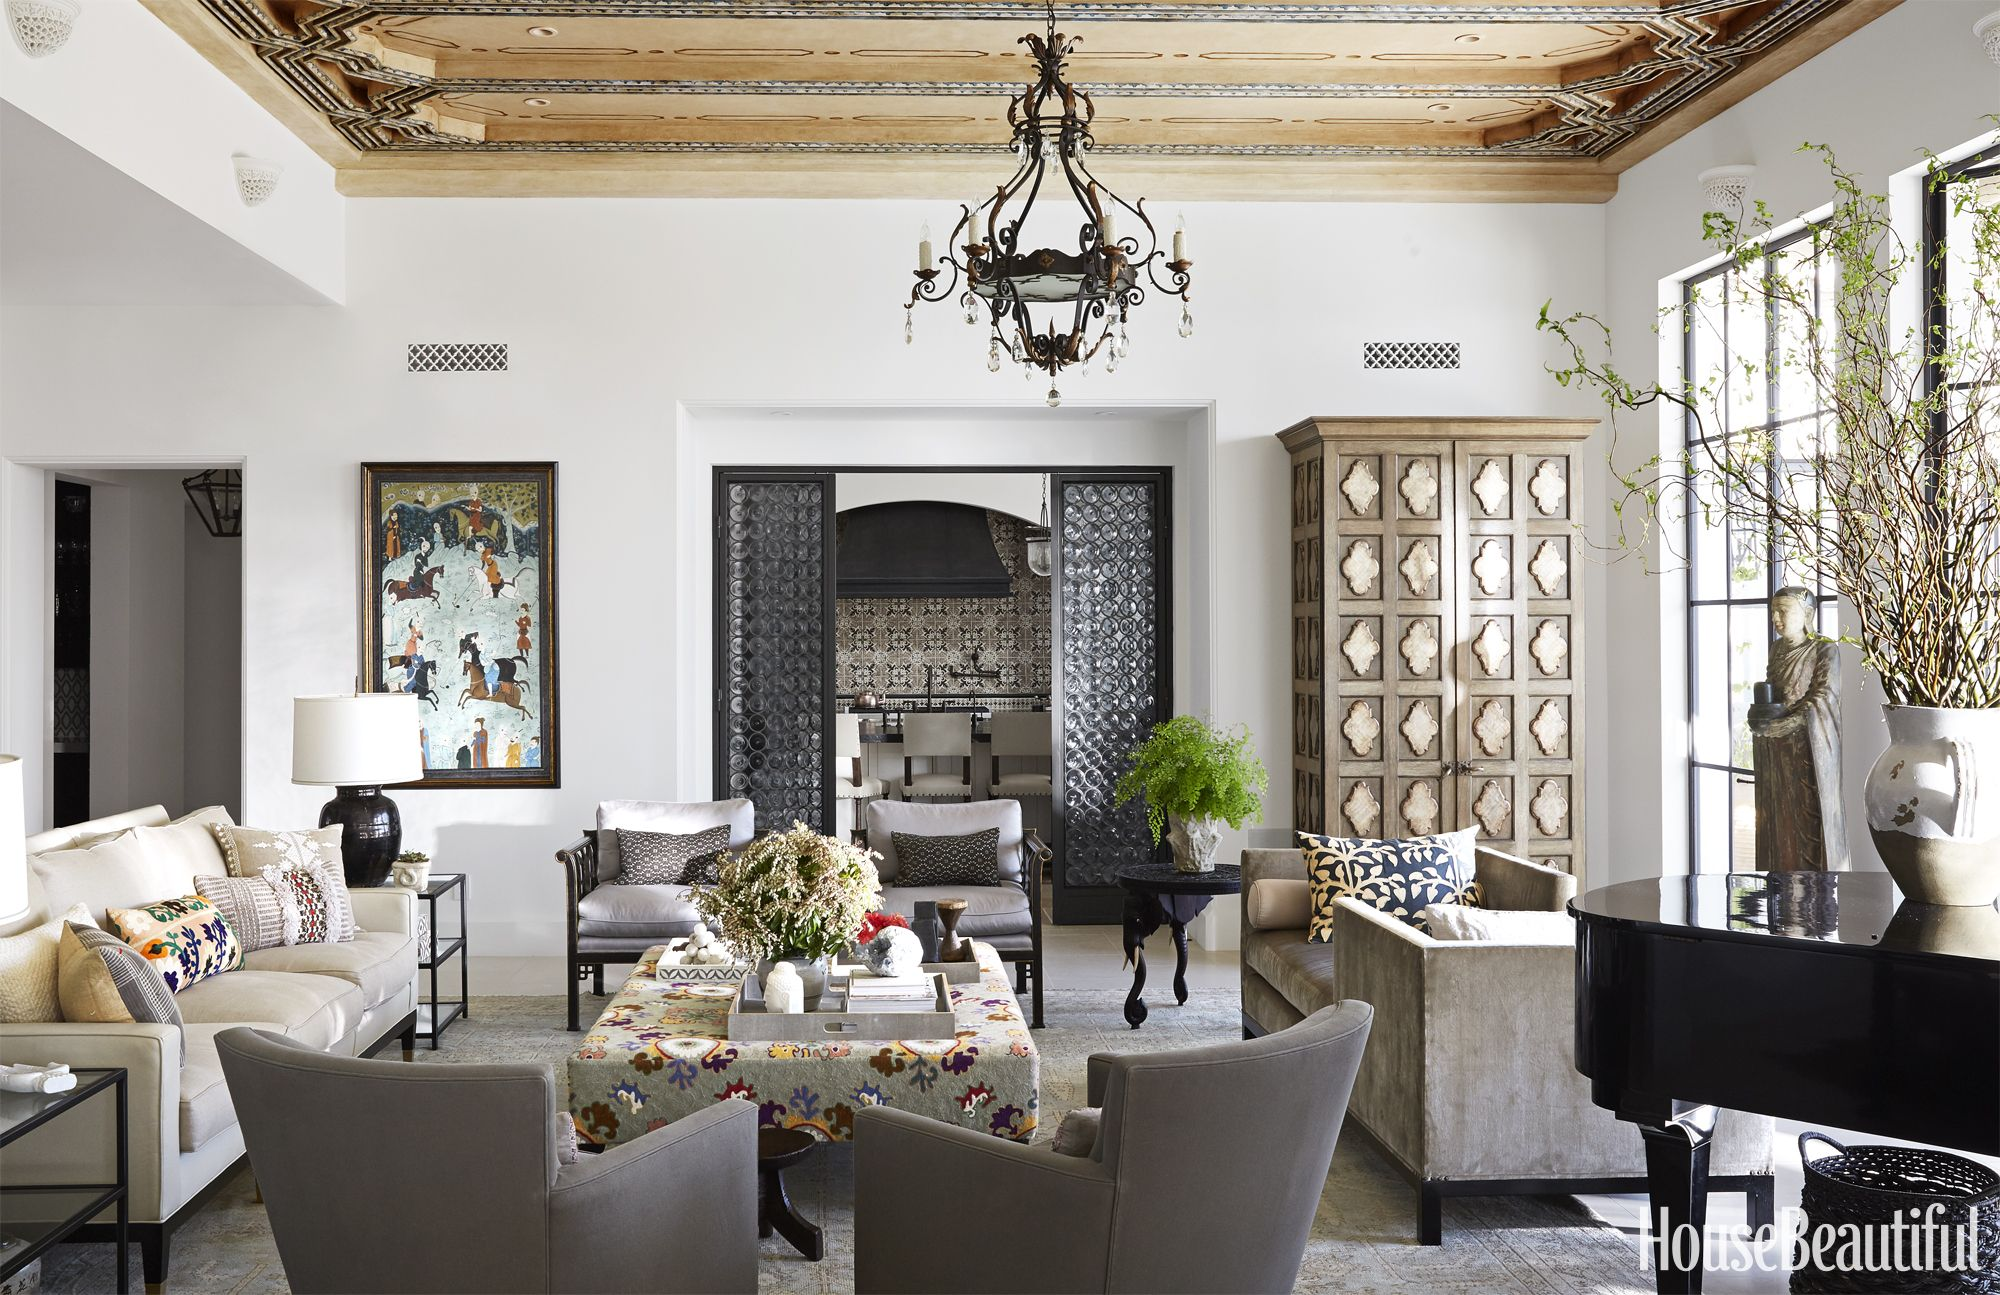 Fullsize Of Interior Design Of A Living Room